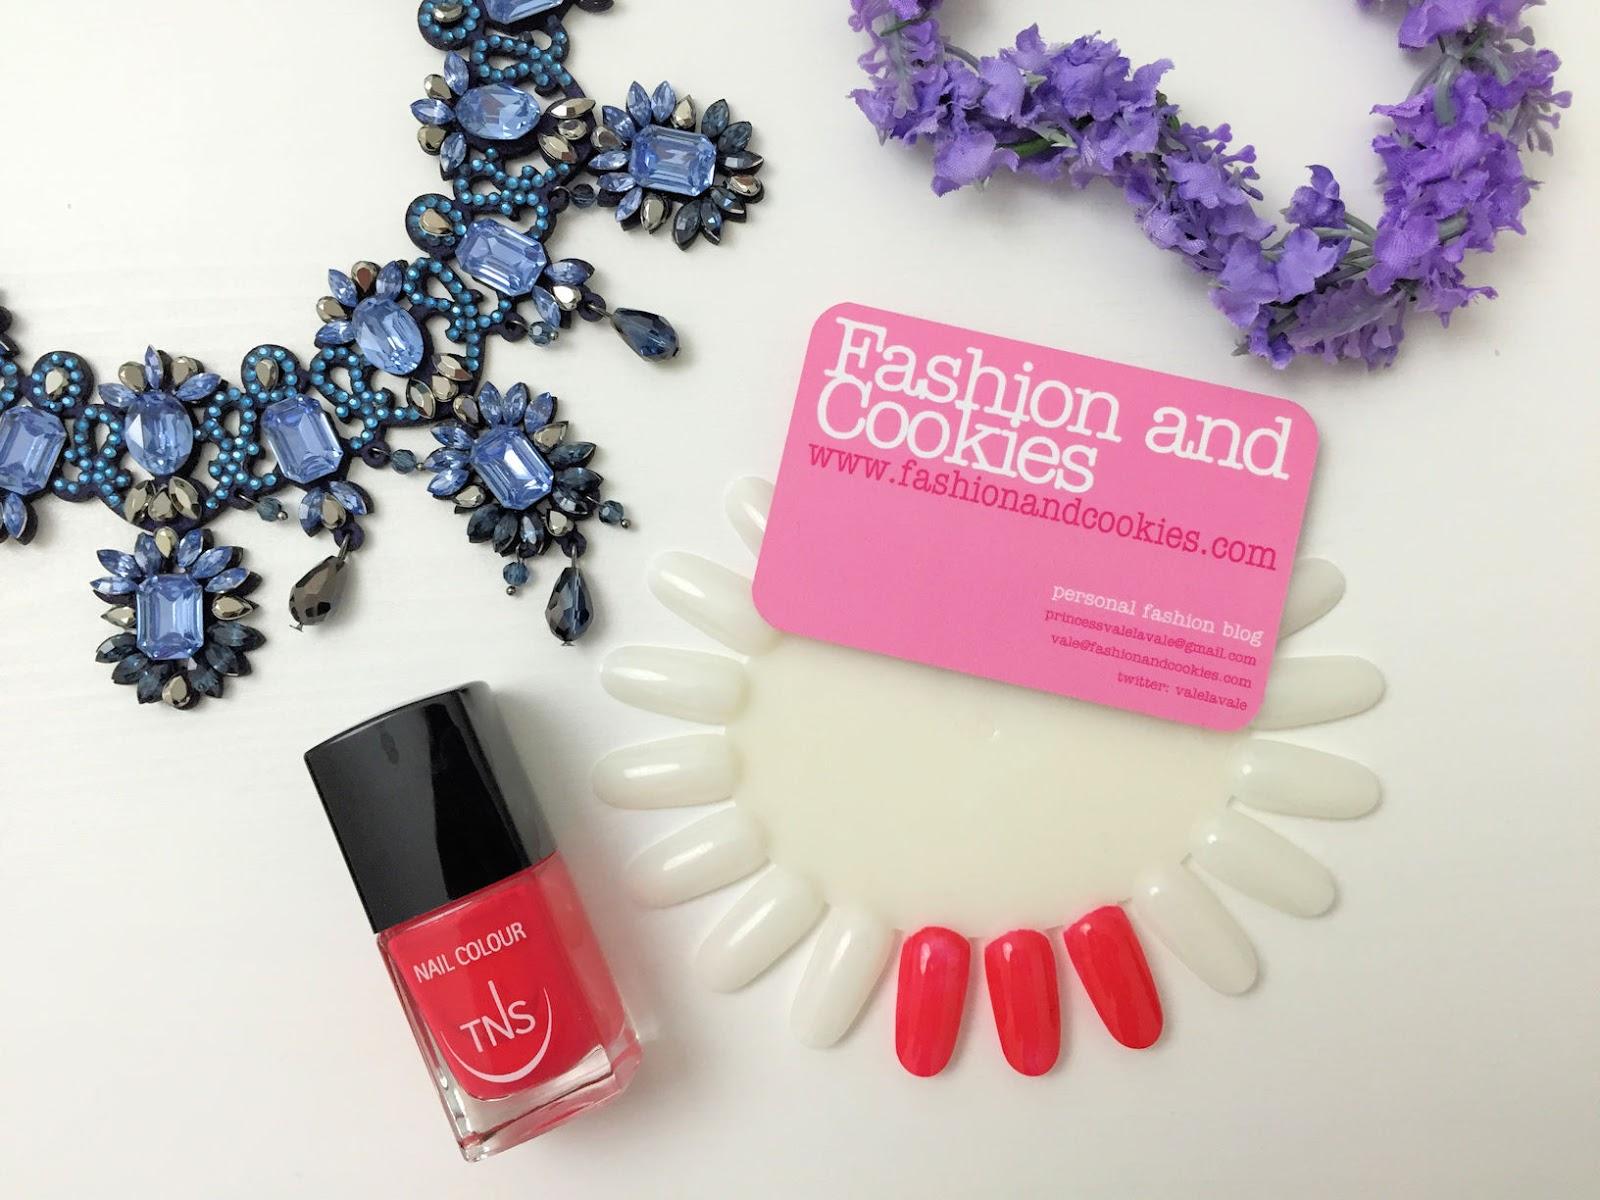 TNS Cosmetics Fashion Week nail polish on Fashion and Cookies beauty blogger, beauty blog